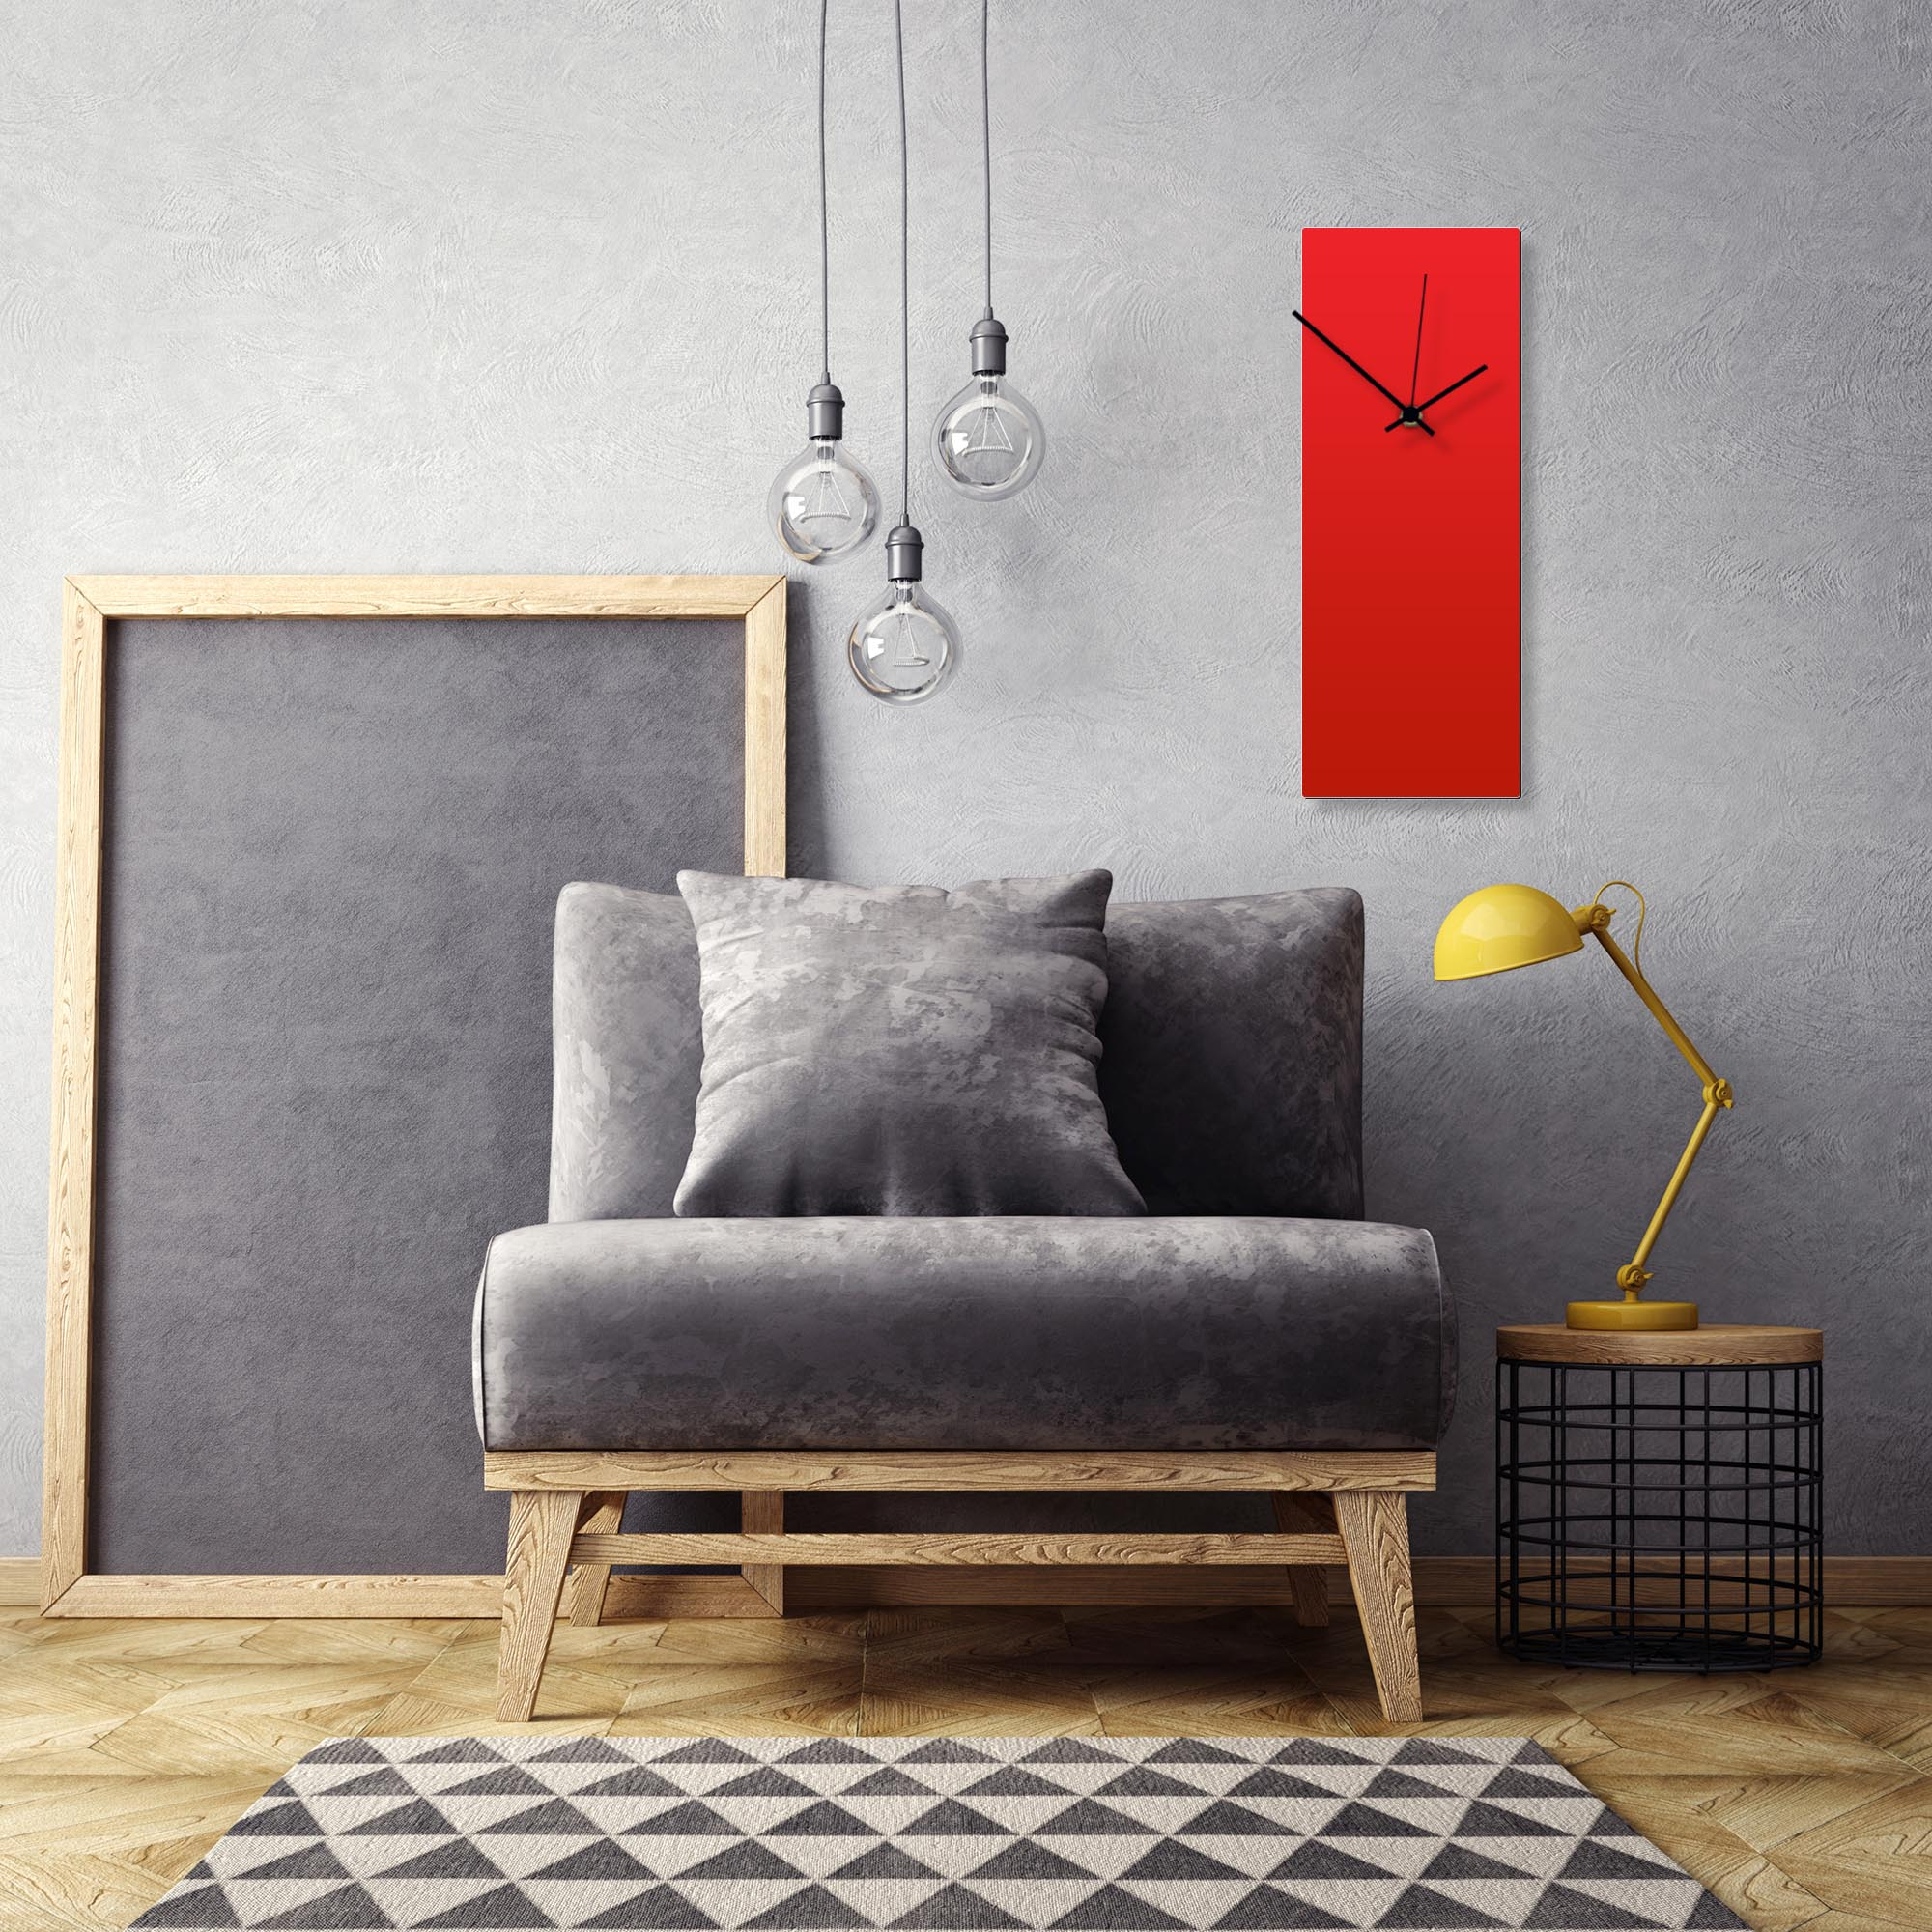 Redout Black Clock Large by Adam Schwoeppe Contemporary Clock on Aluminum Polymetal - Alternate View 1